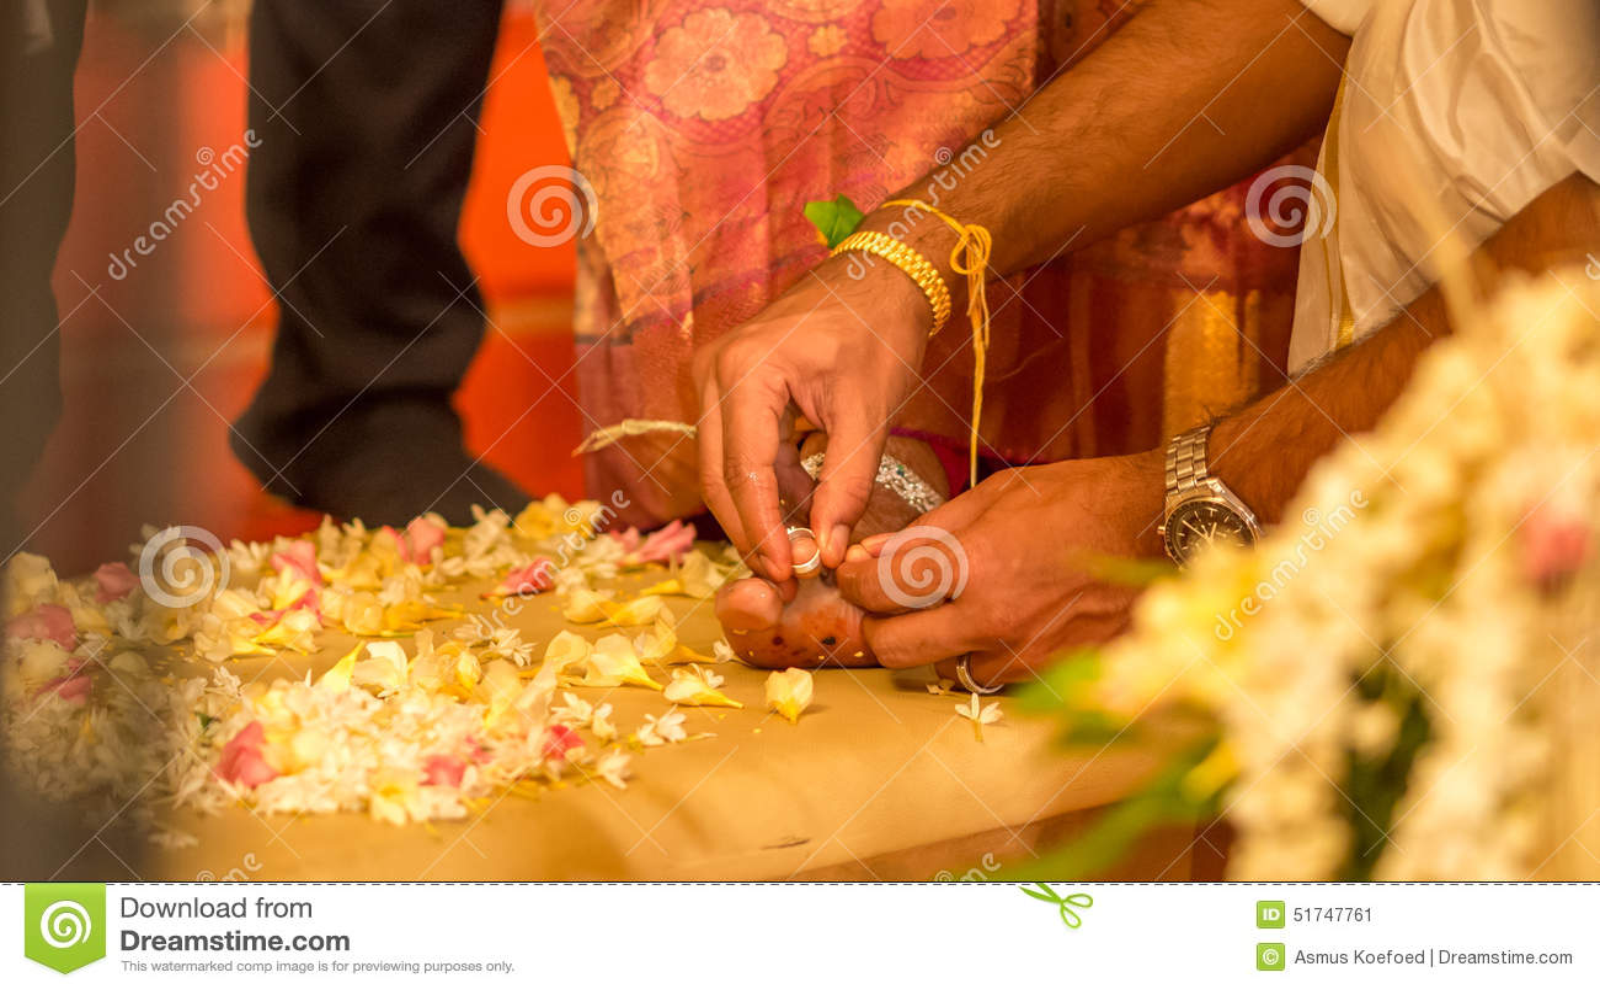 Indian Wedding Ring On Brides Foot Stock Image Image Of Bridegroom